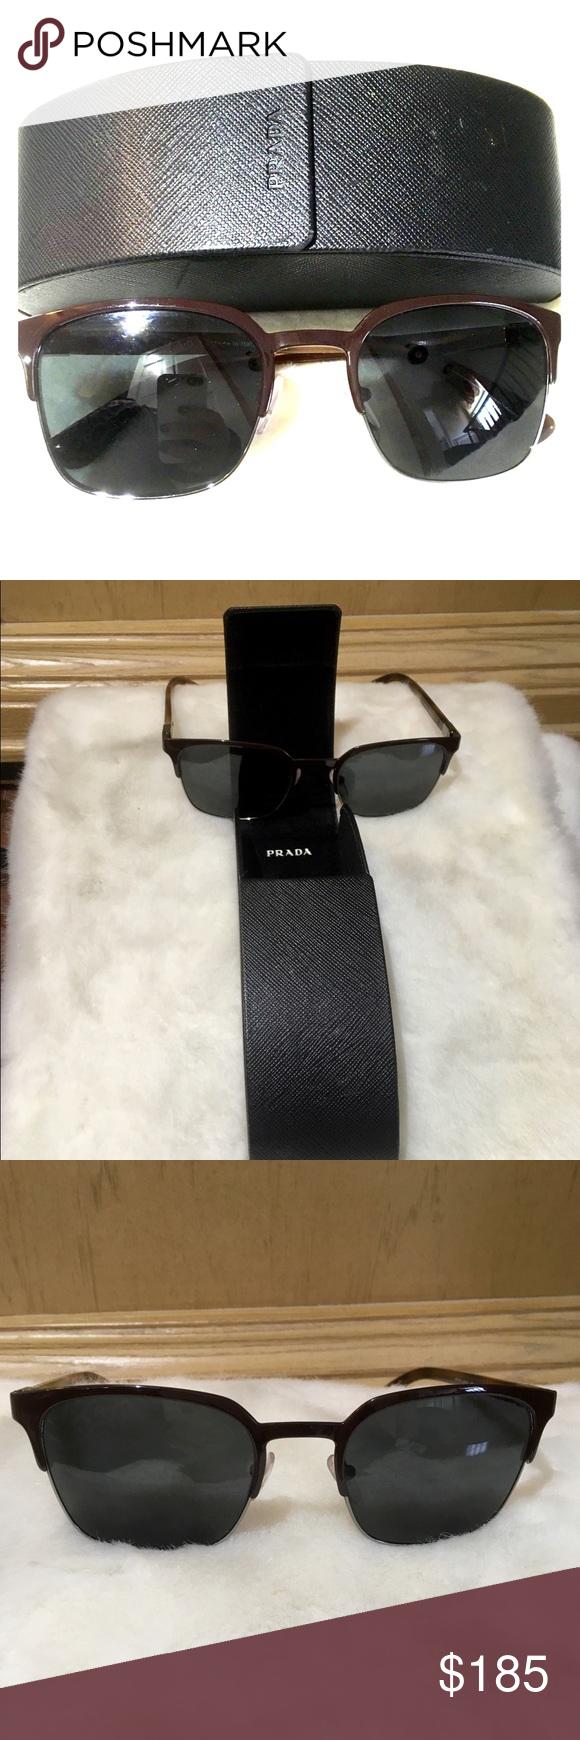 cee63b3ce8 PRADA 🕶Sunglasses🕶 with Protective Hard Case Prada SPR61S Matte Brown Gunmetal  Polarized Sunglasses